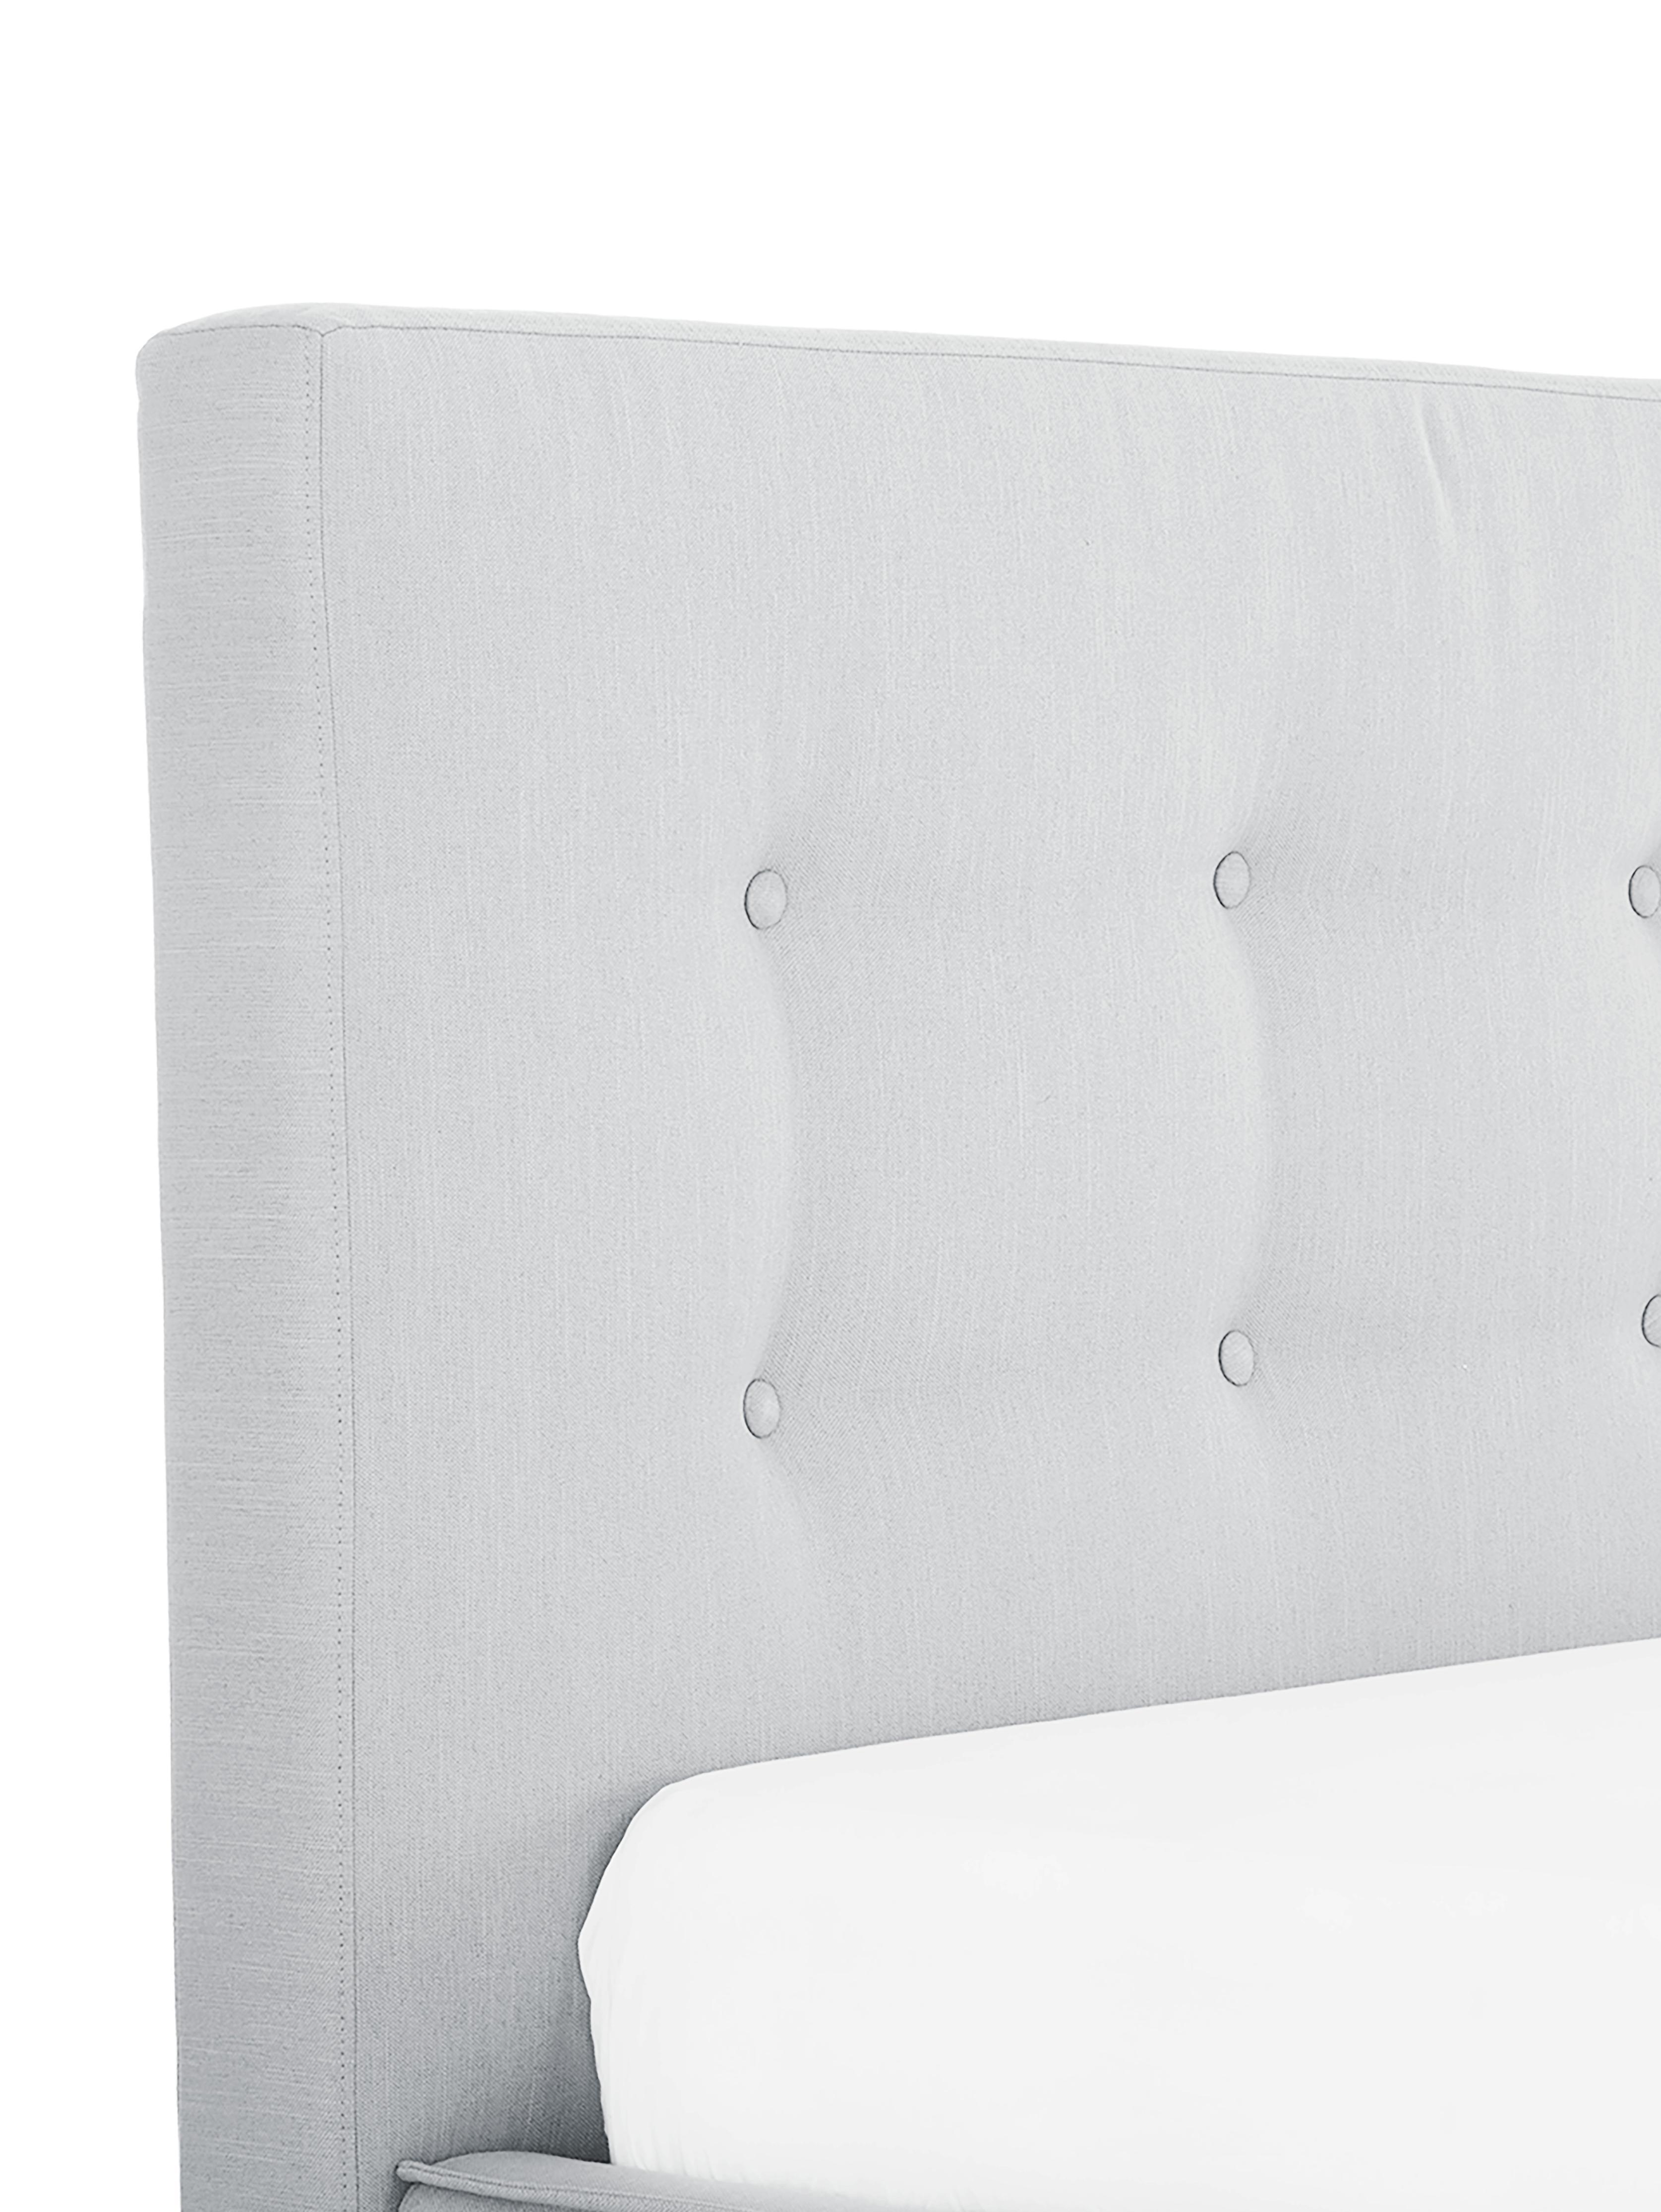 Polsterbett Moon, Korpus: Massives Kiefernholz, Bezug: Polyester (Strukturstoff), Hellgrau, 180 x 200 cm